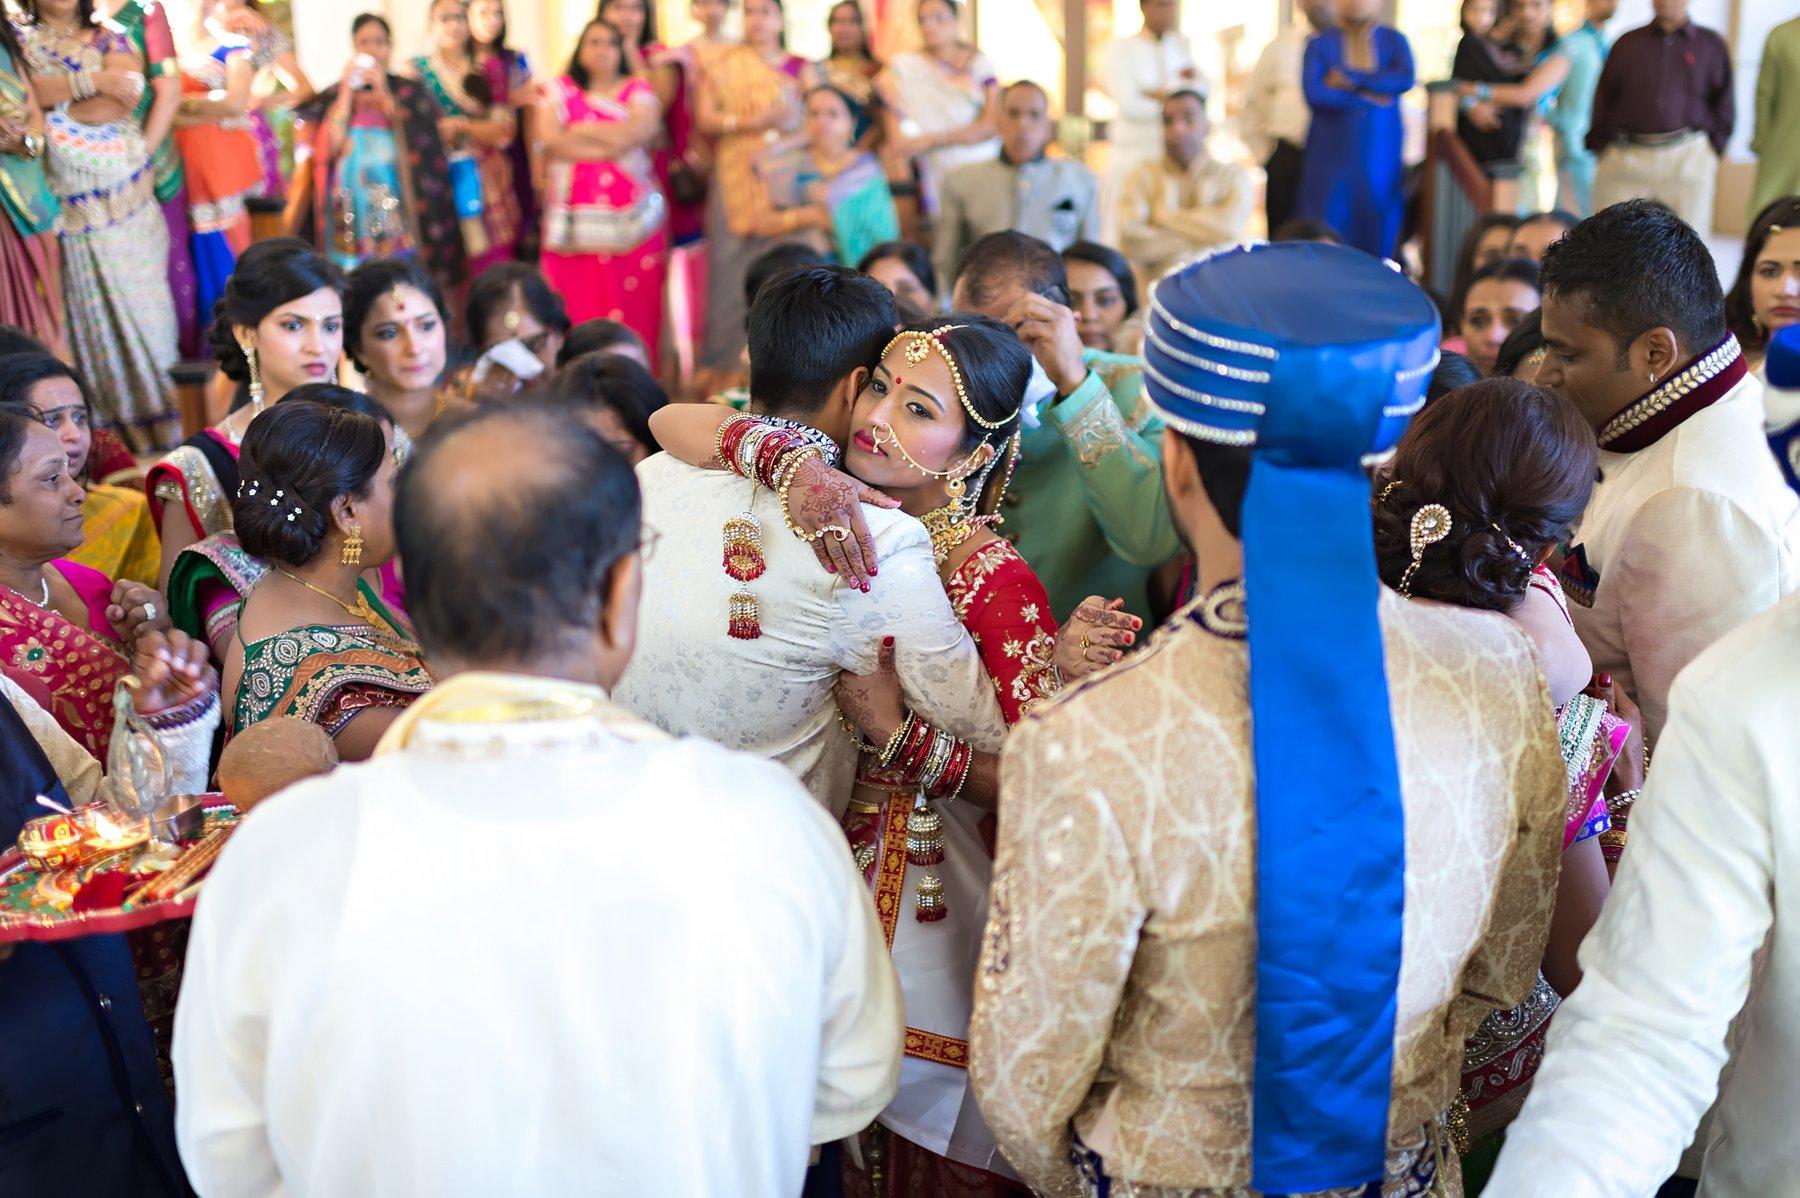 Shivani + Ajay | Hindu Indian Wedding | Innisbrook Resort, Tampa, Miami Wedding Photographers | Häring Photography, Indian Wedding Photographer in Florida, Best Muslim, Hindu - South East Asian Wedding Photographers